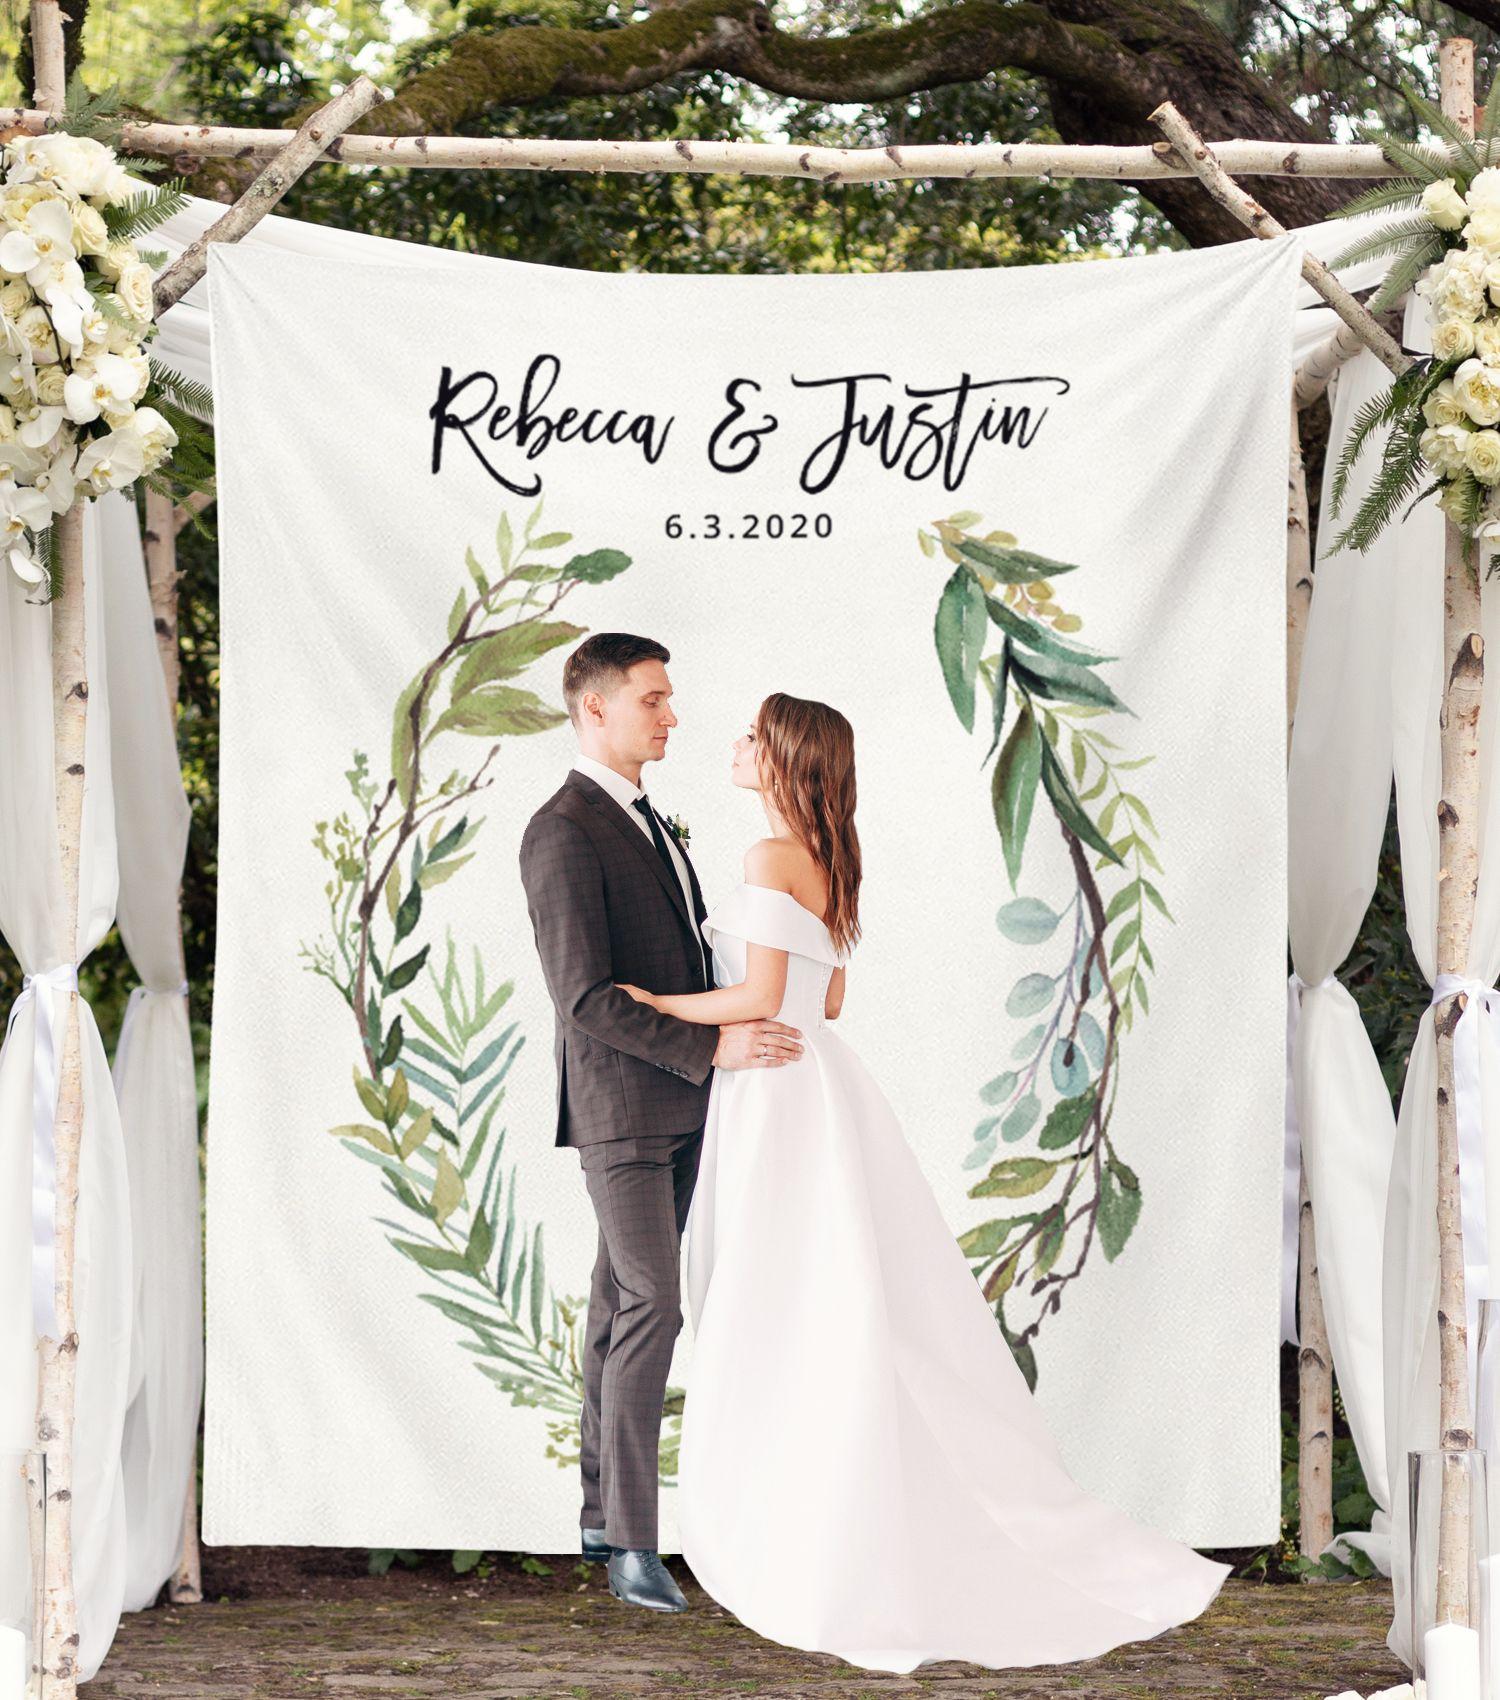 Outdoor Wedding Ceremony Whitby: Greenery Wedding Photo Backdrop